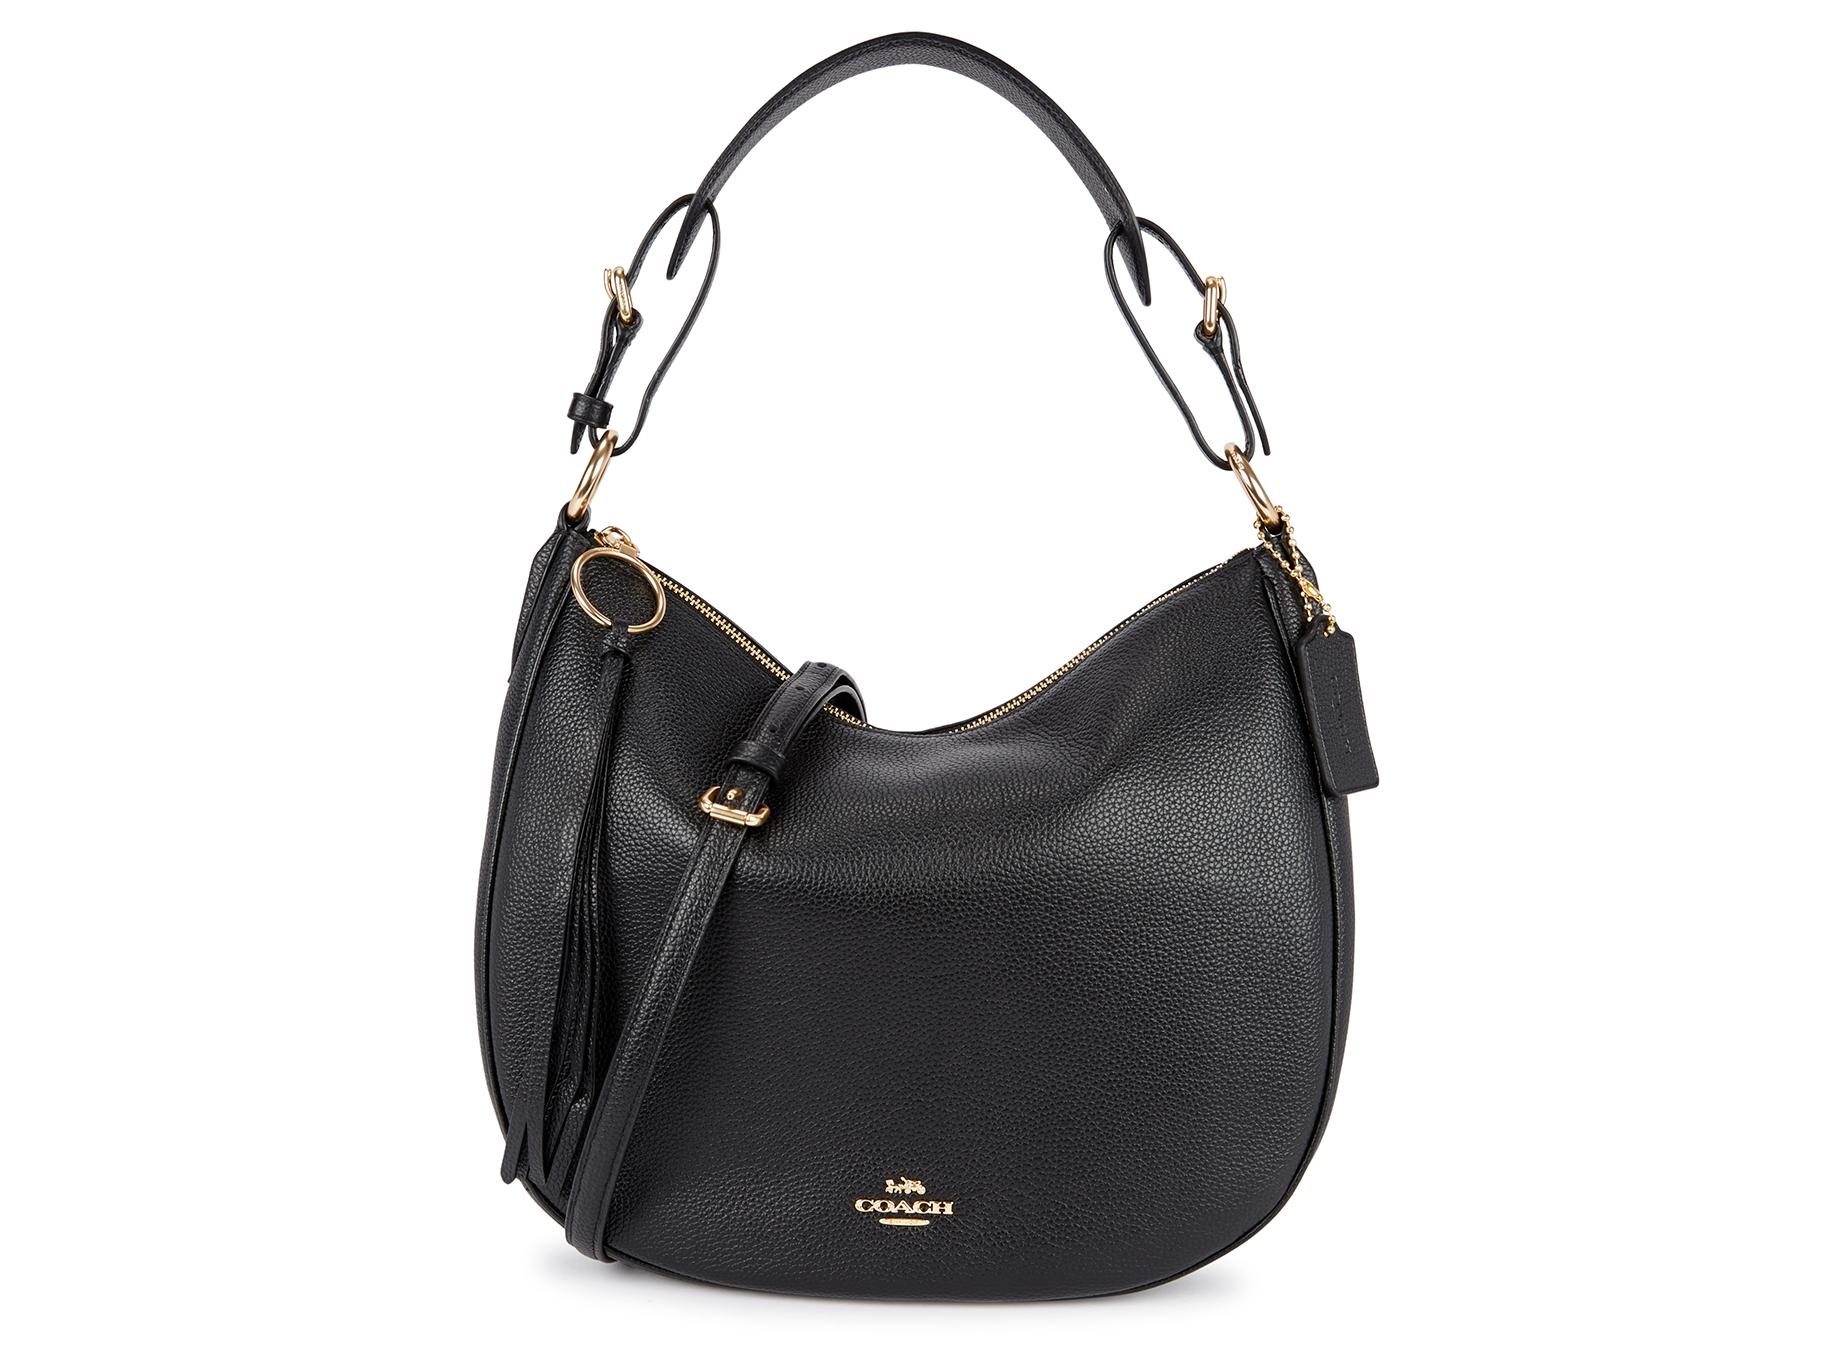 b1d2cfe1b777cf Coach Sutton black leather hobo bag - Harvey Nichols